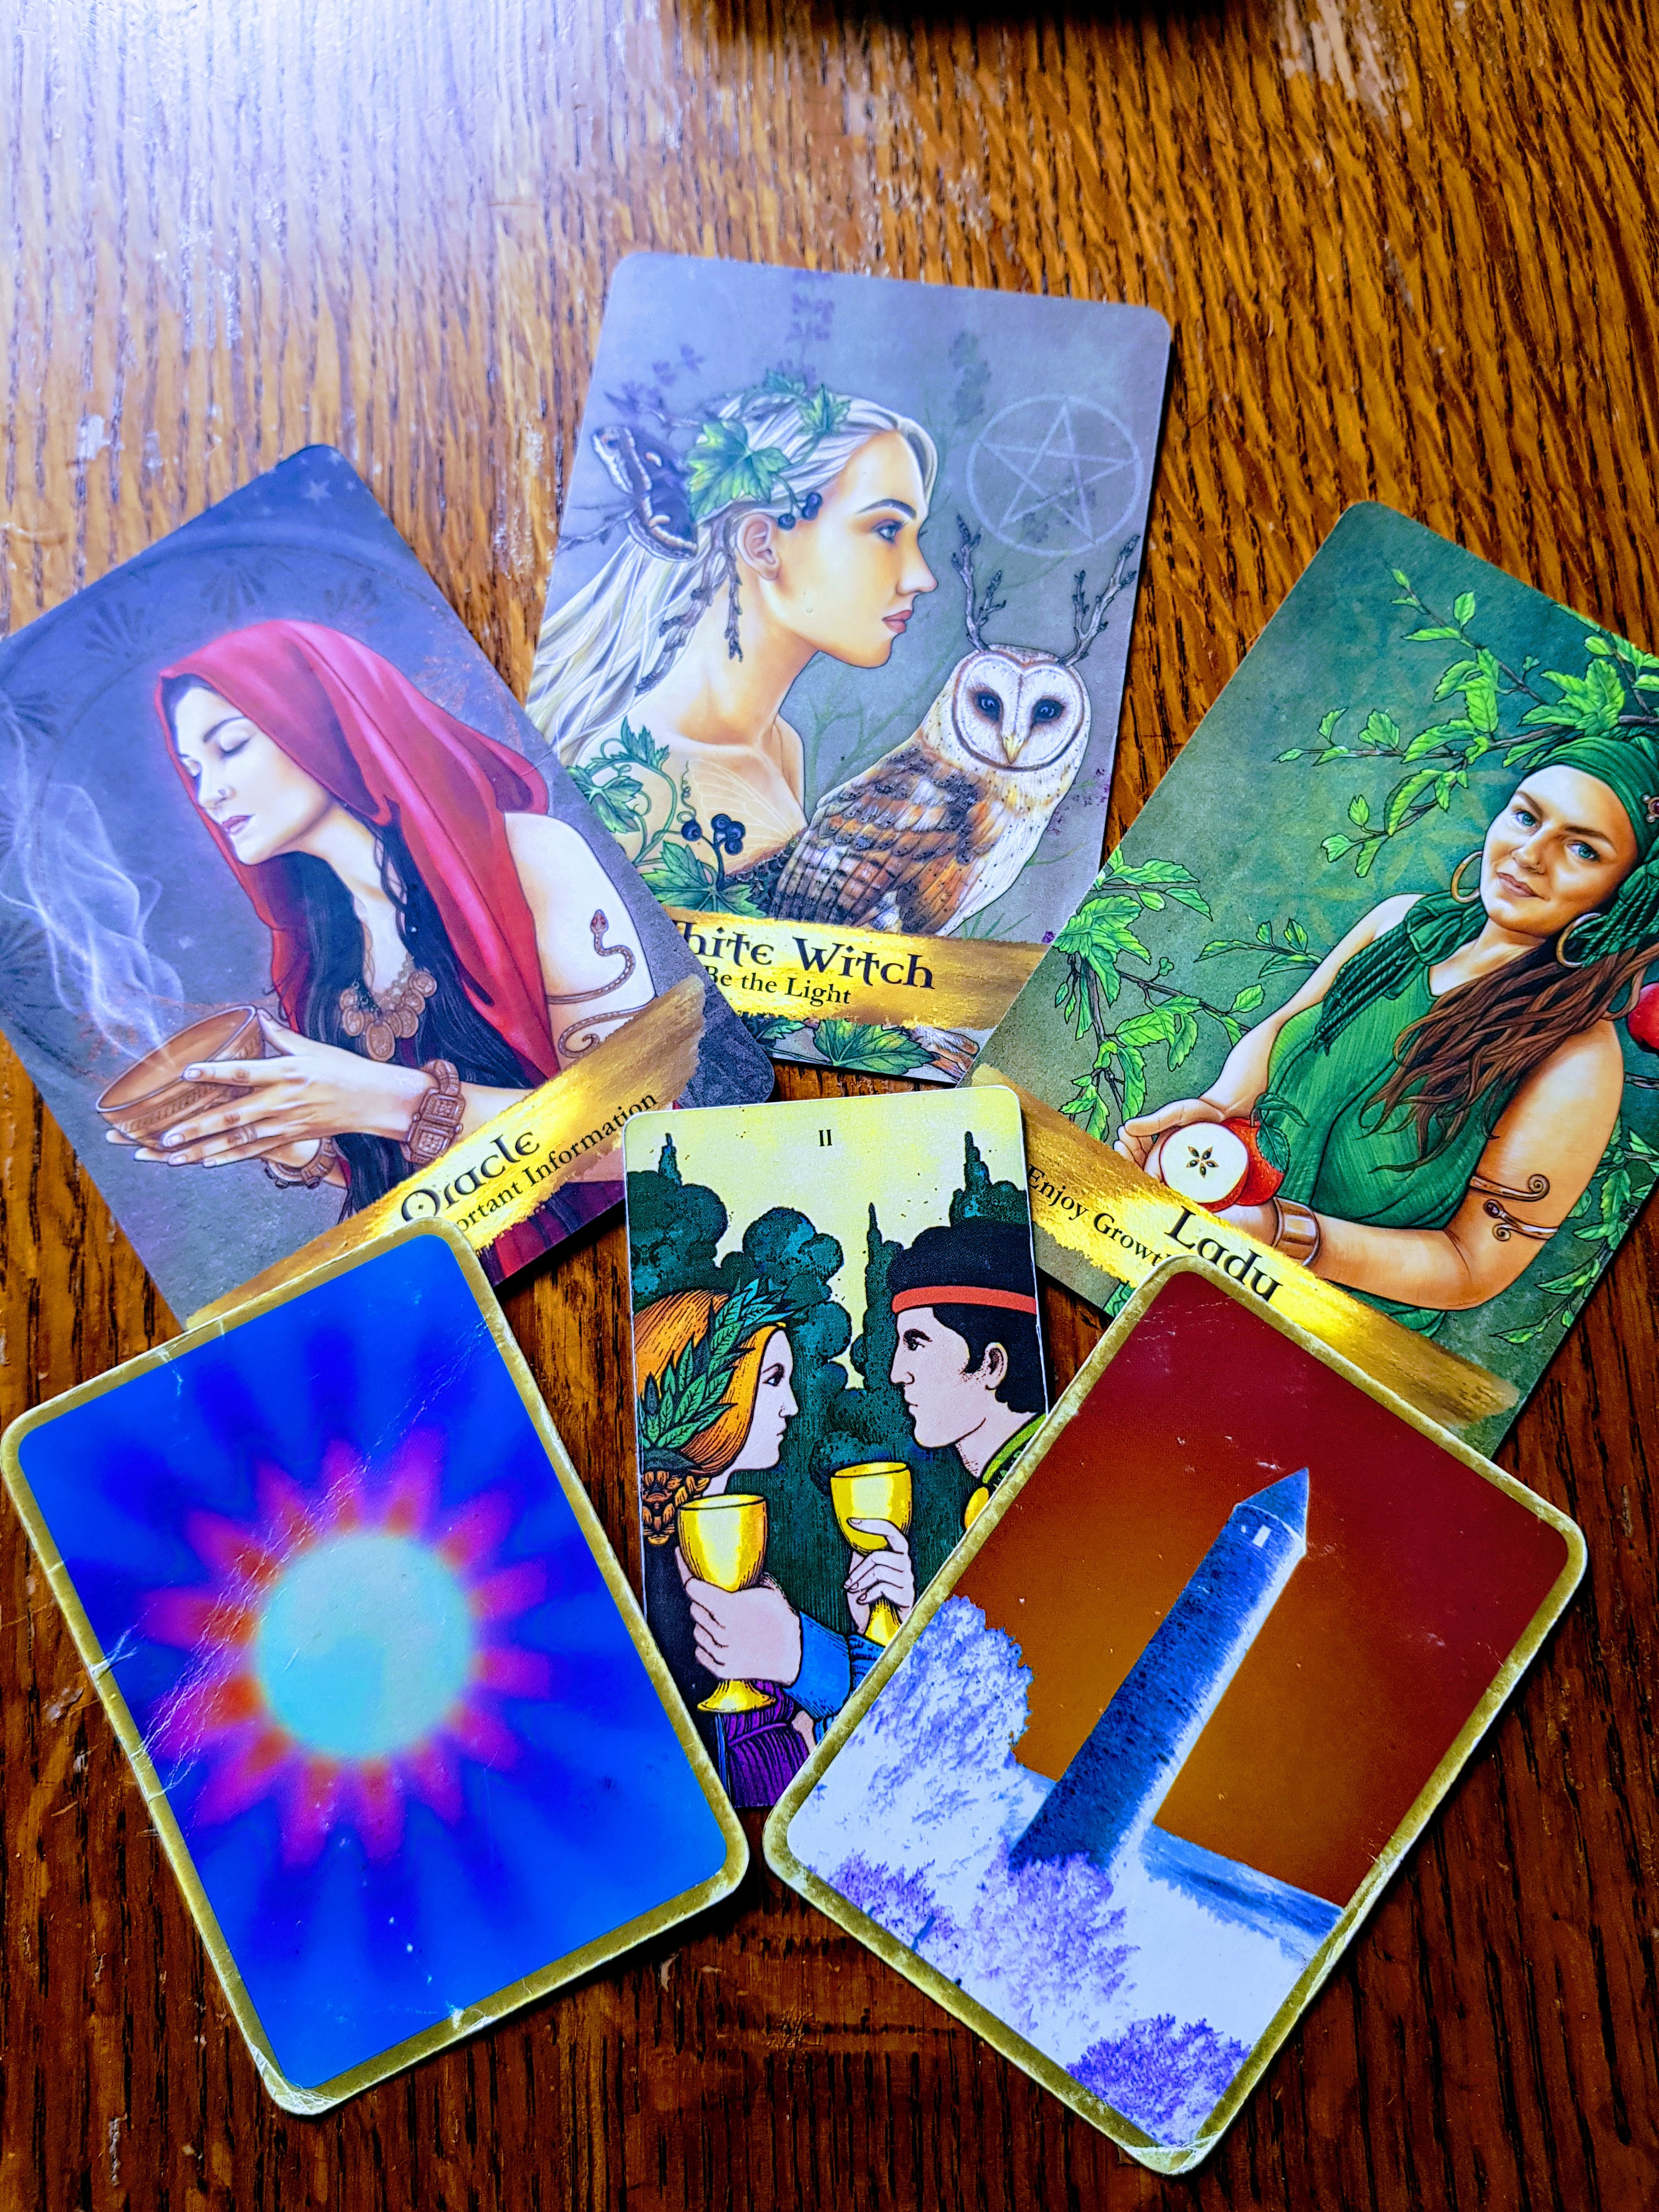 TAROT AND ORACAL CARD READINGS